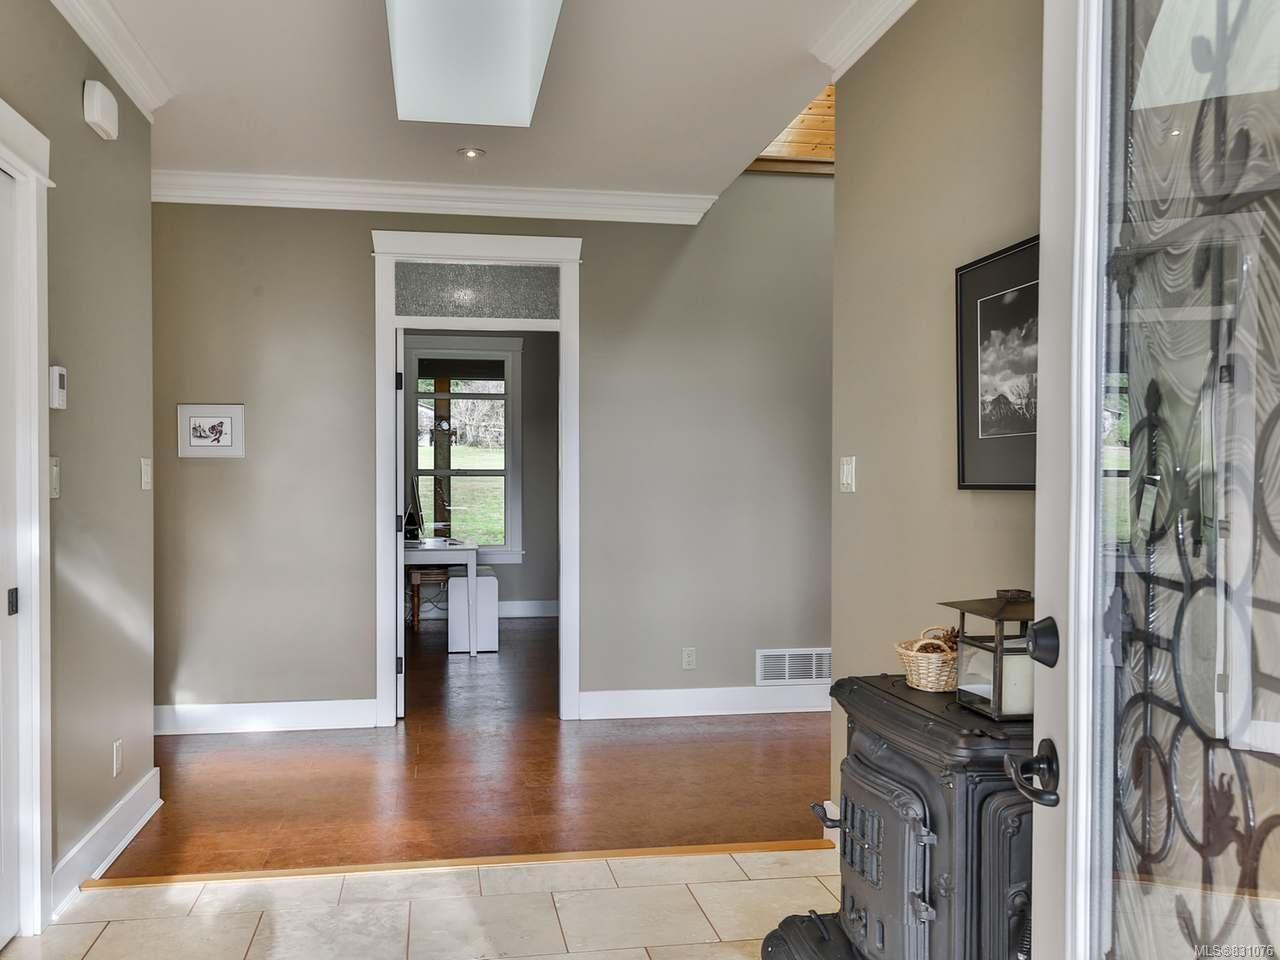 Photo 3: Photos: 6159 Strathcona St in PORT ALBERNI: PA Alberni Valley House for sale (Port Alberni)  : MLS®# 831076